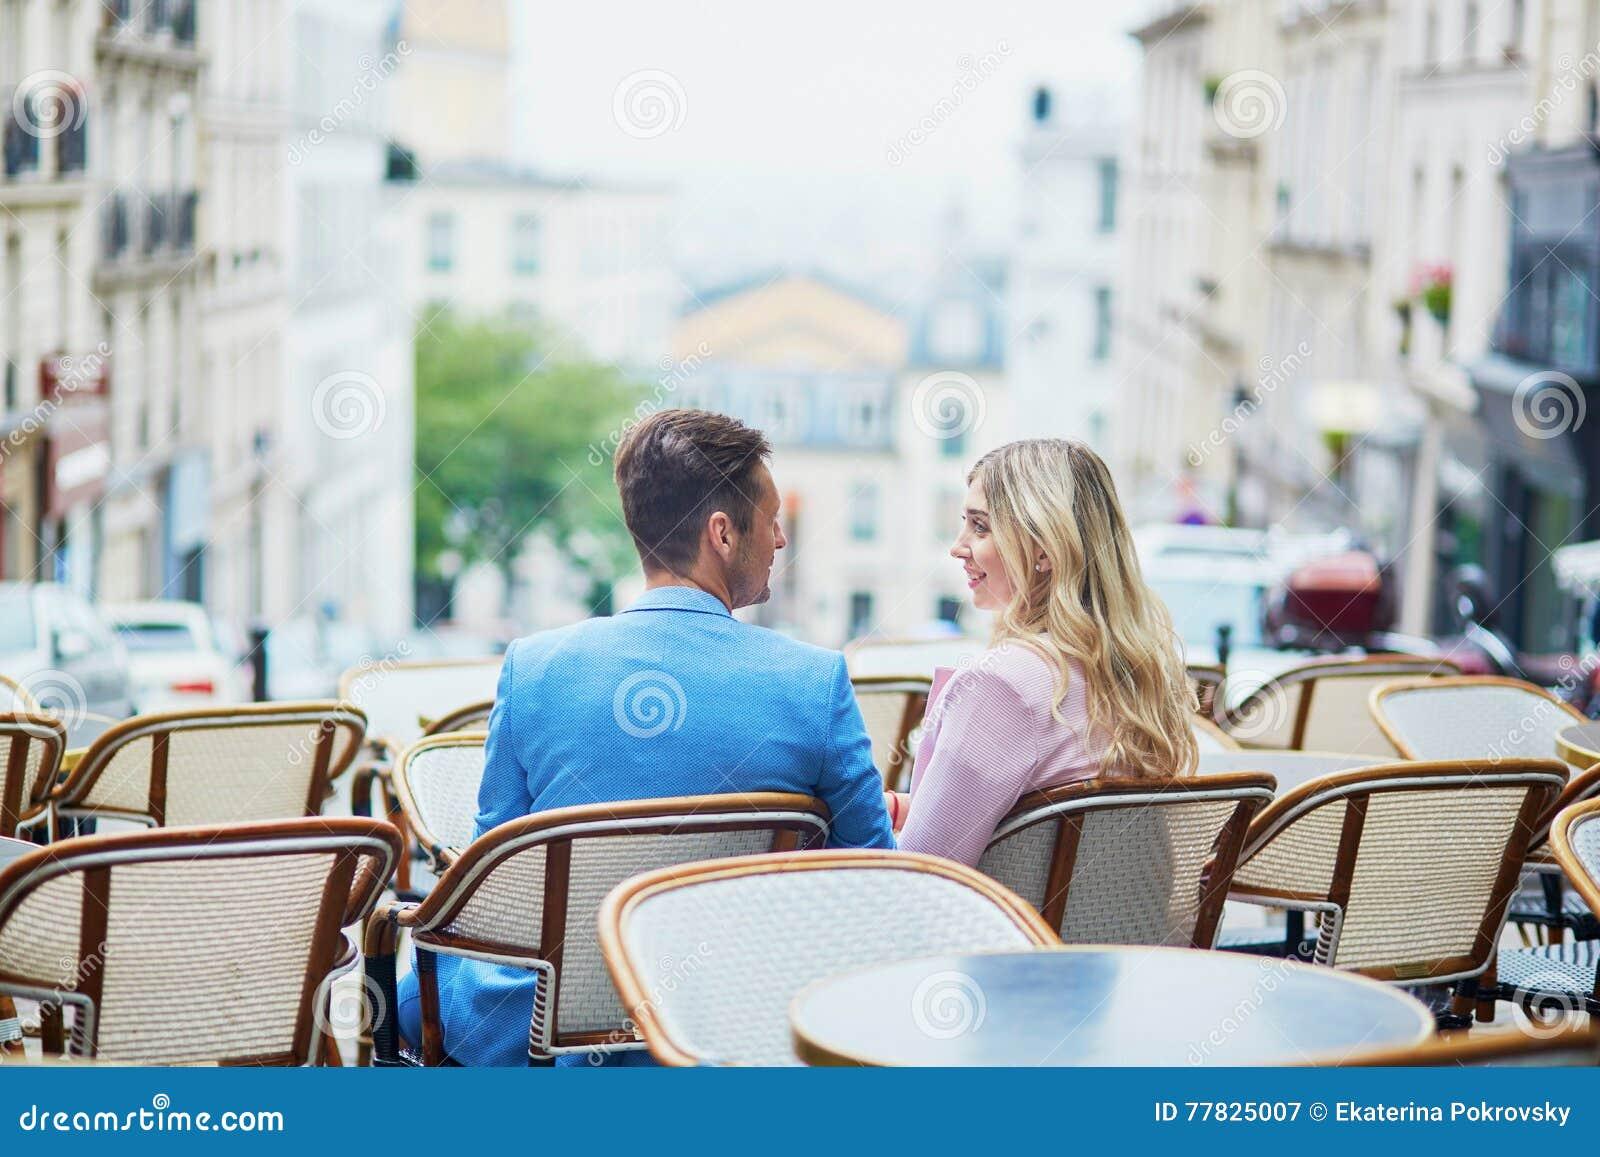 dating paris france radioisotope dating vs. alternative methods